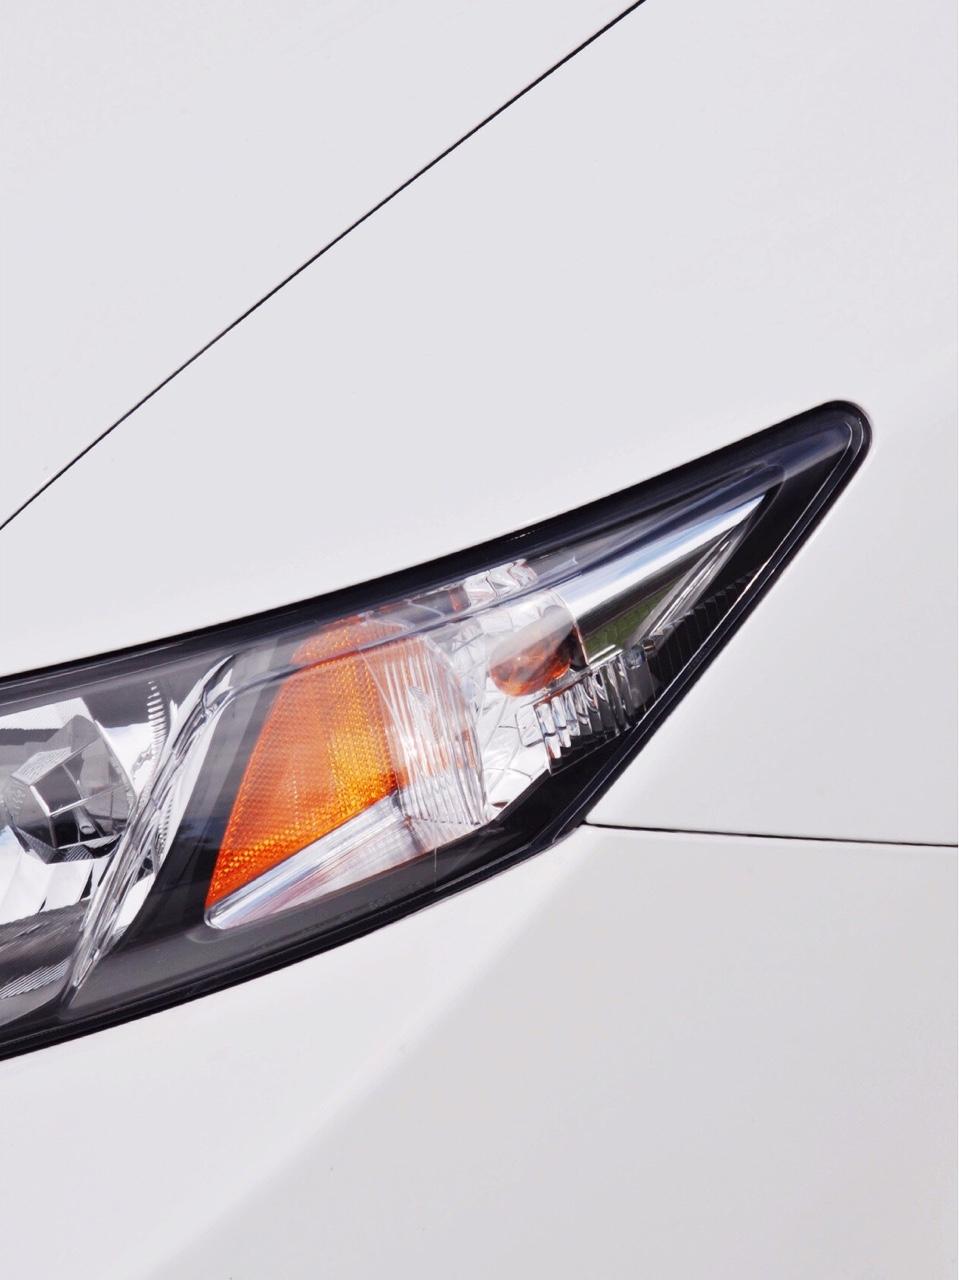 blakeafox: Car headlight, 2014